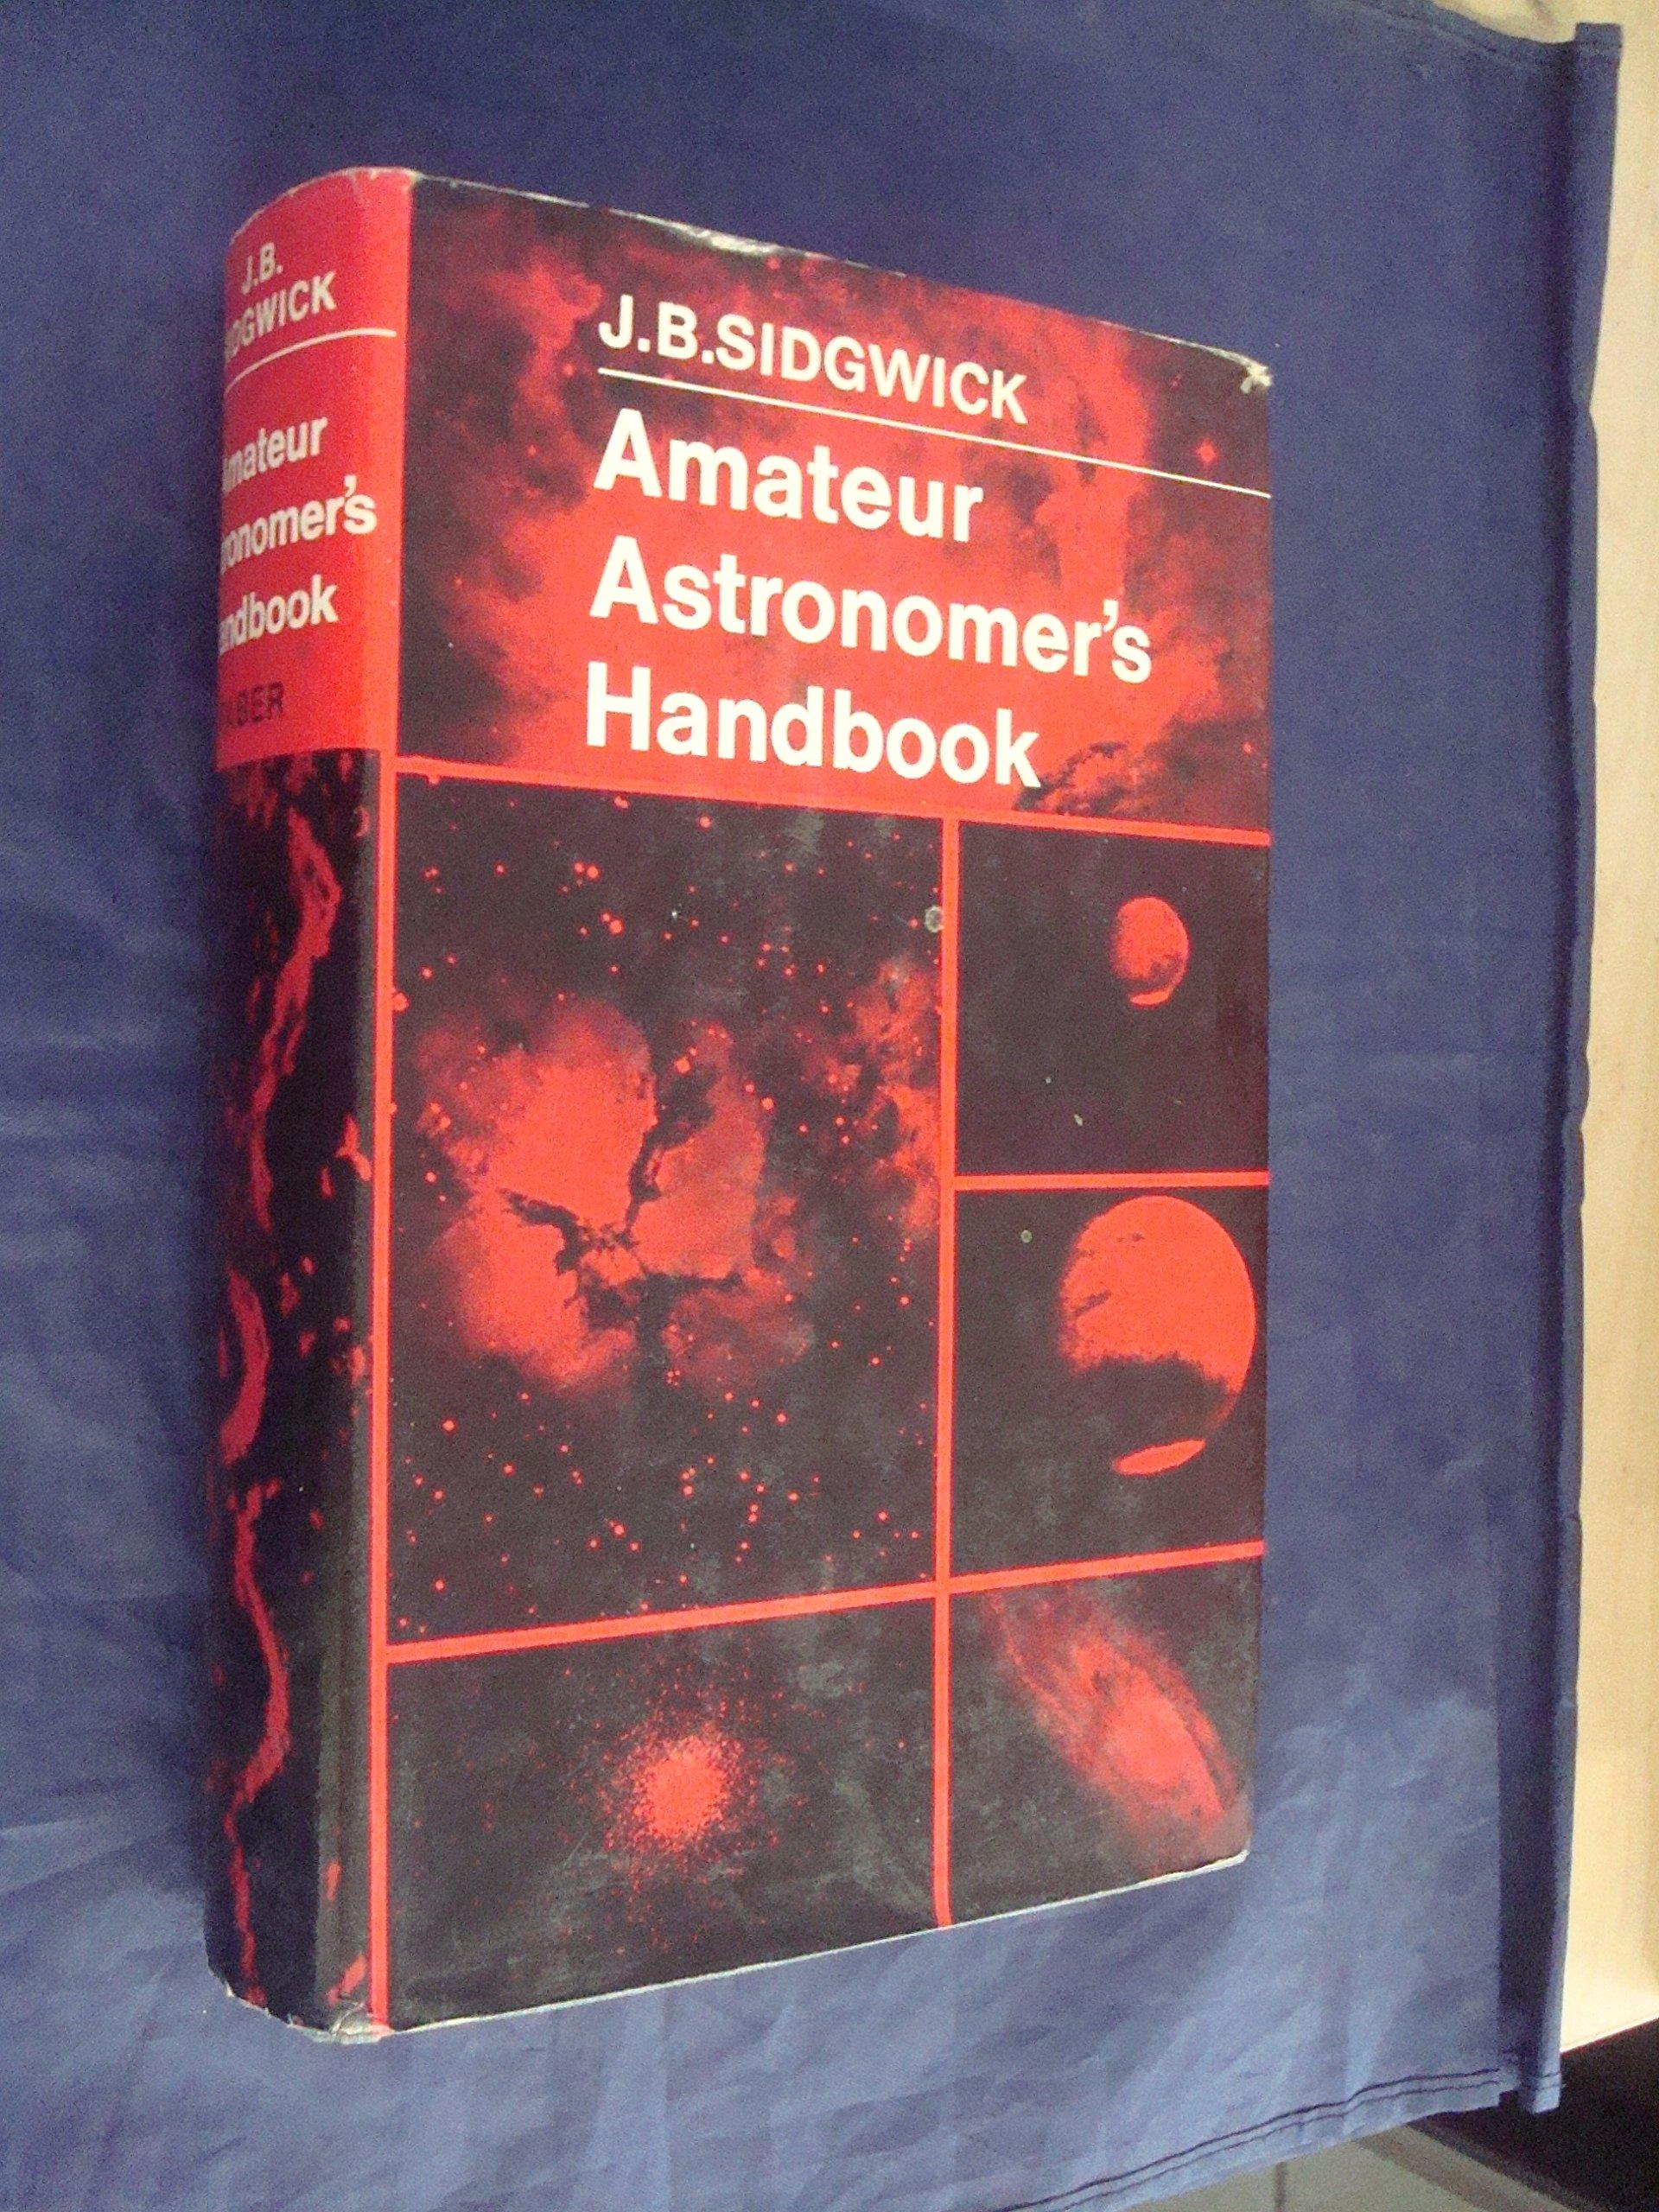 Amateur Astronomer's Handbook, Sidgwick, J.B.